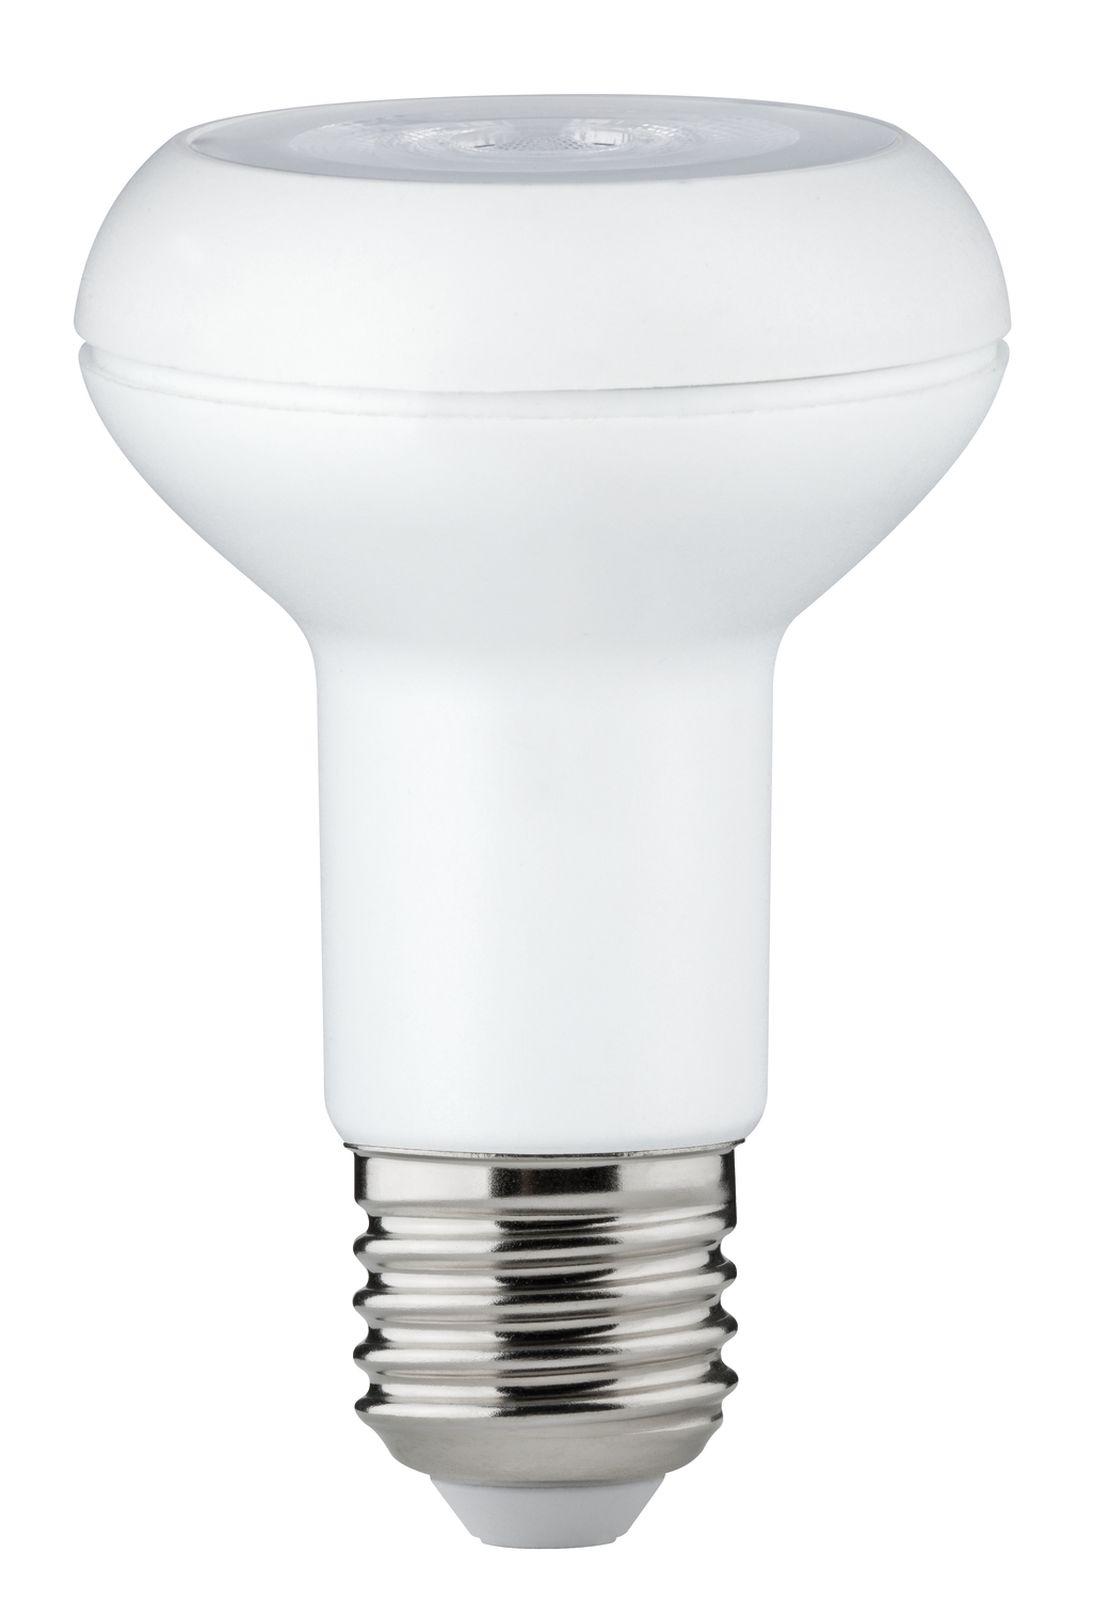 paulmann led reflektorlampe warmwei r63 5w e27 markenbaumarkt24. Black Bedroom Furniture Sets. Home Design Ideas